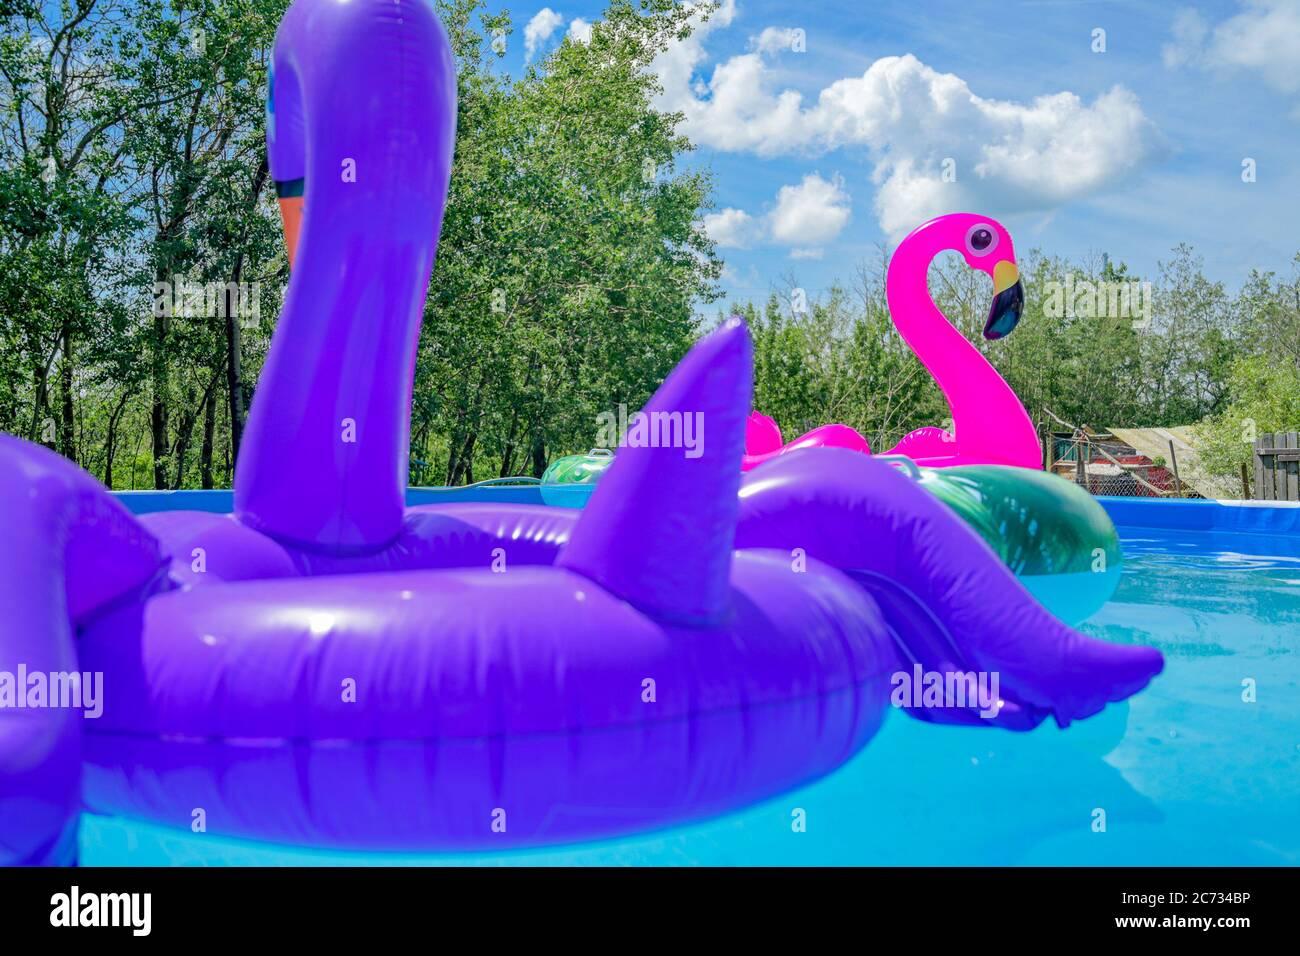 Inflatable Flamingo toy, swimming pool Stock Photo